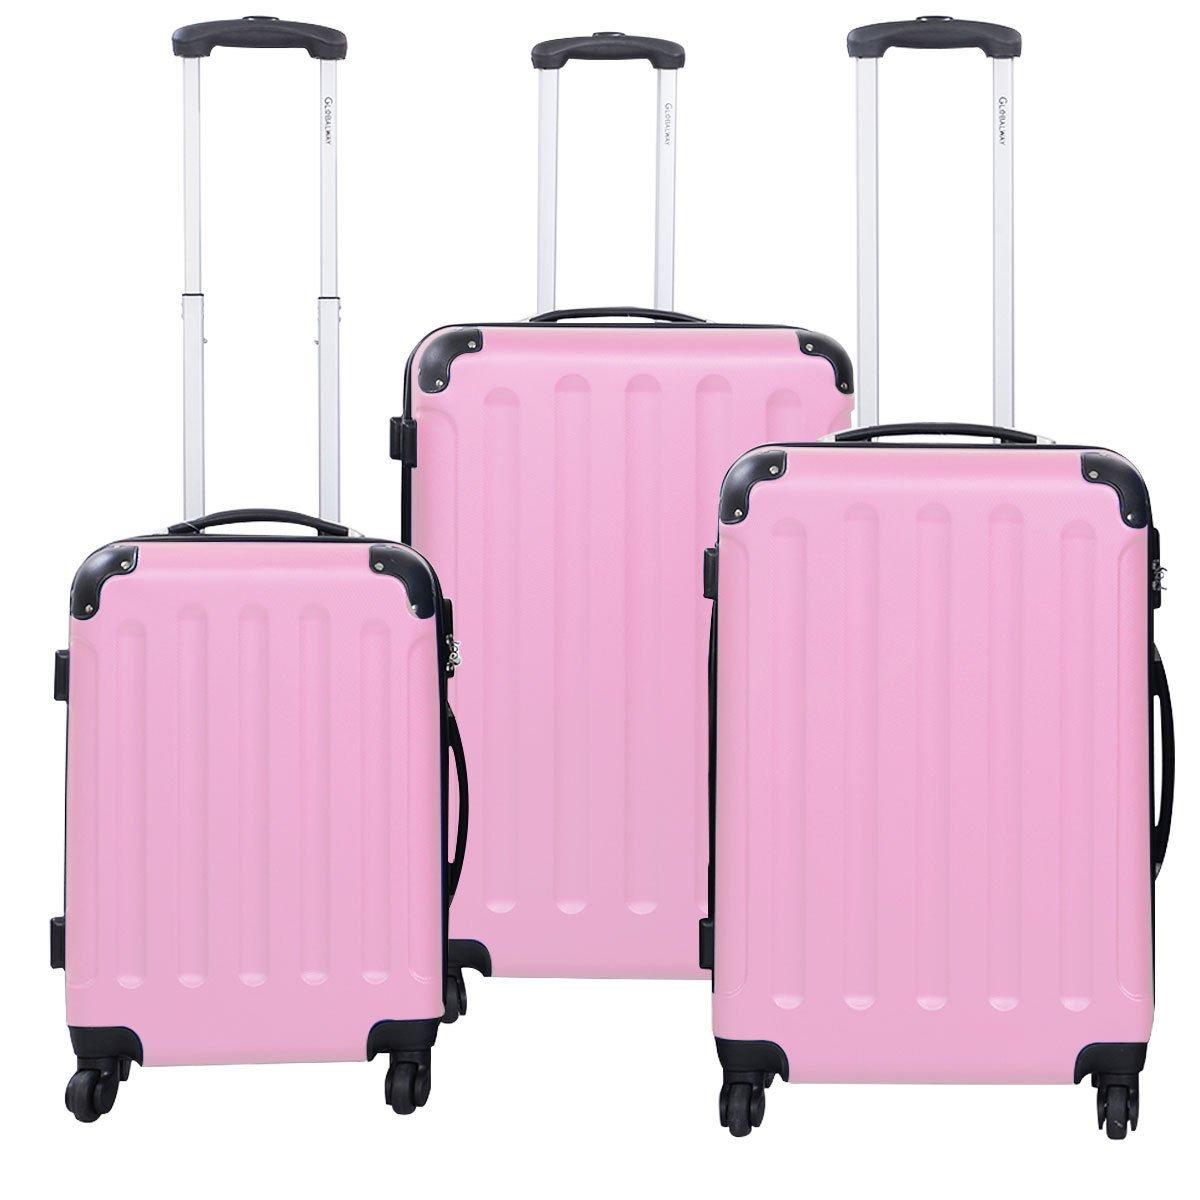 3 Pcs Luggage Travel Set Bag ABS+PC Trolley Suitcase Pink